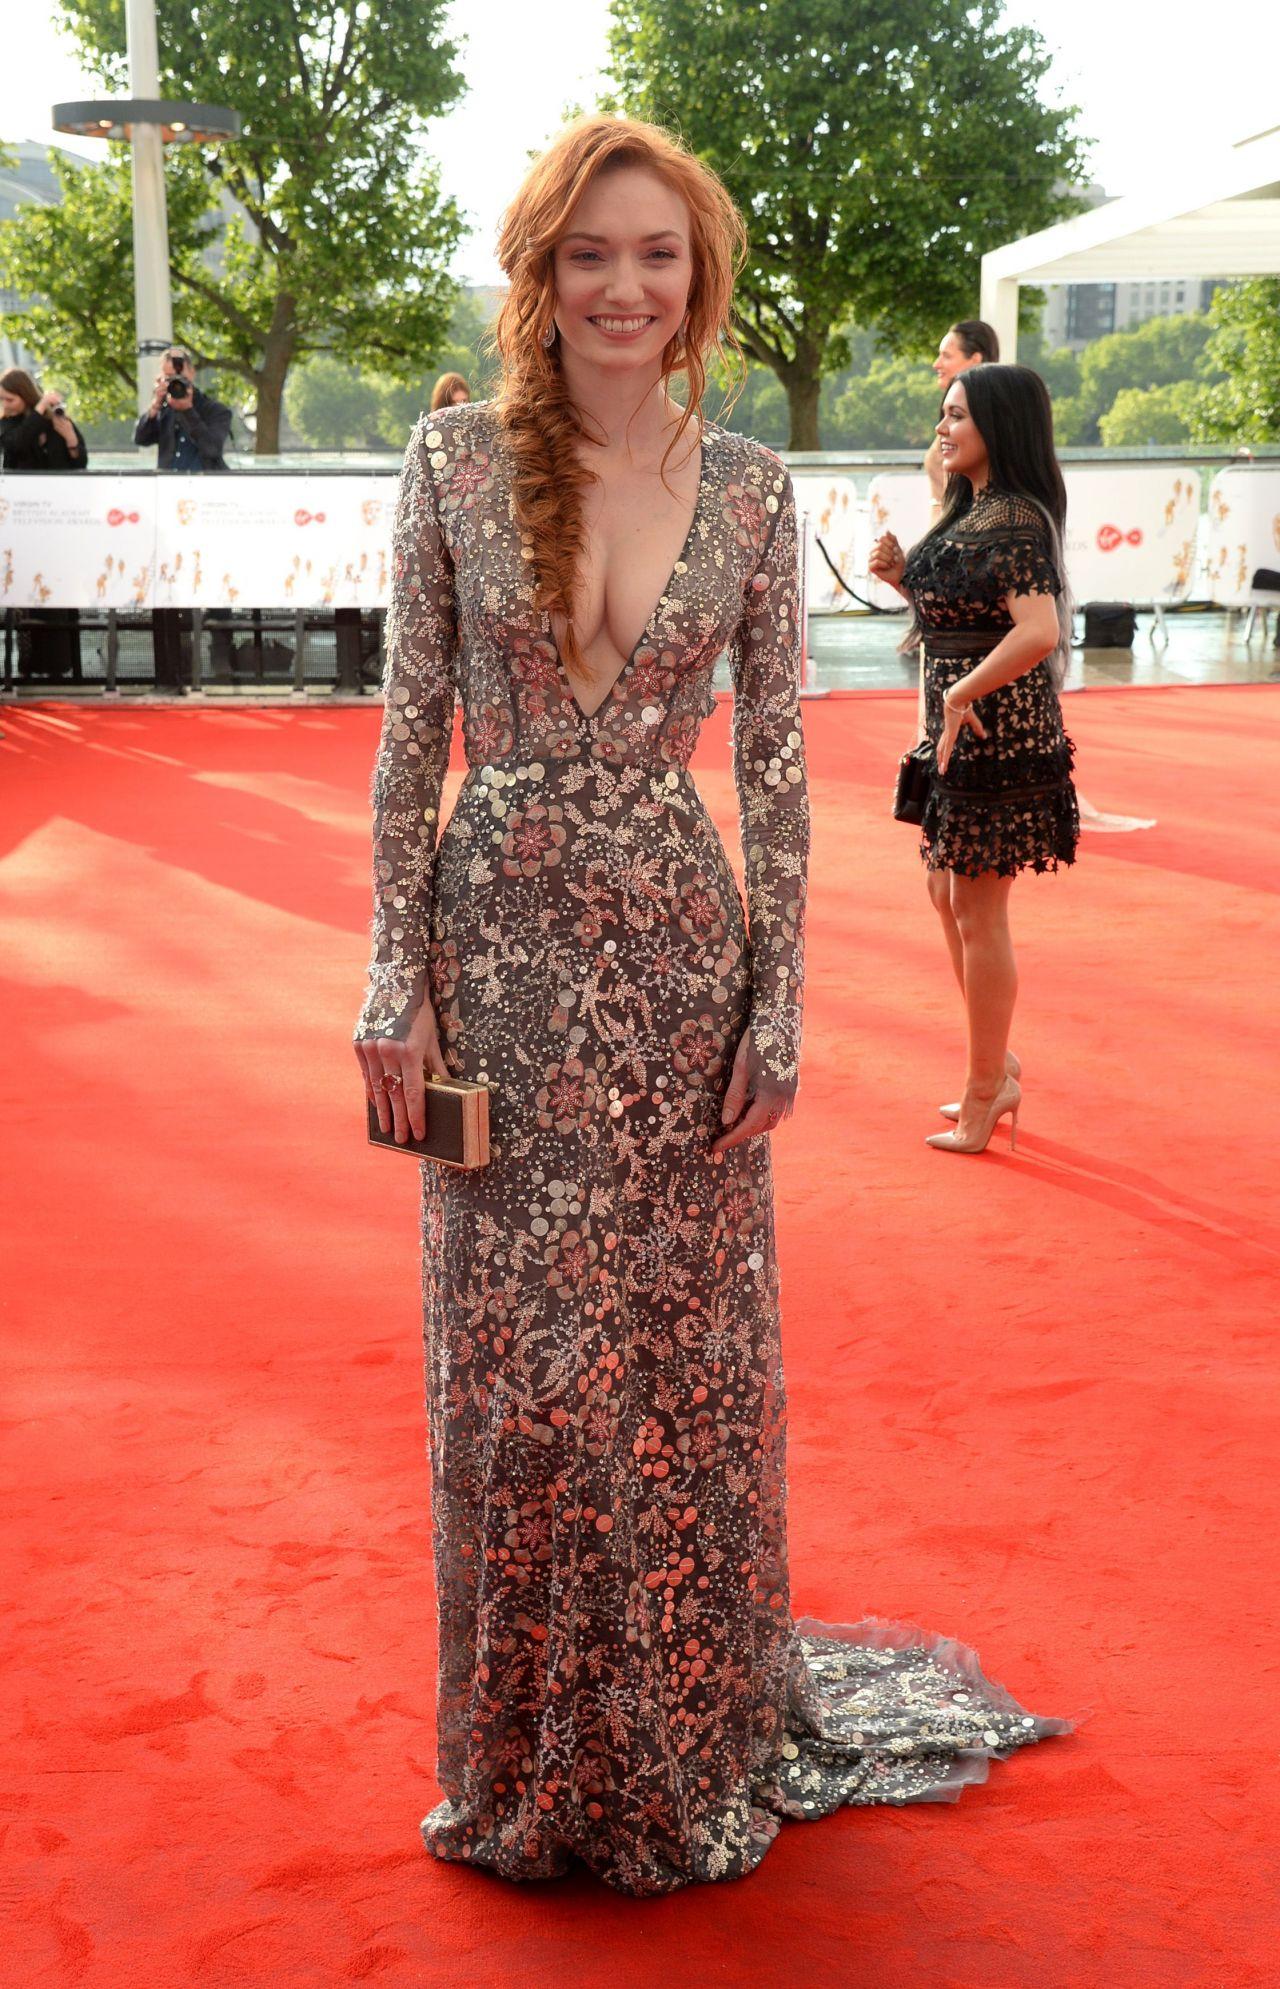 http://celebmafia.com/wp-content/uploads/2017/05/eleanor-tomlinson-bafta-television-awards-in-london-05-14-2017-11.jpg